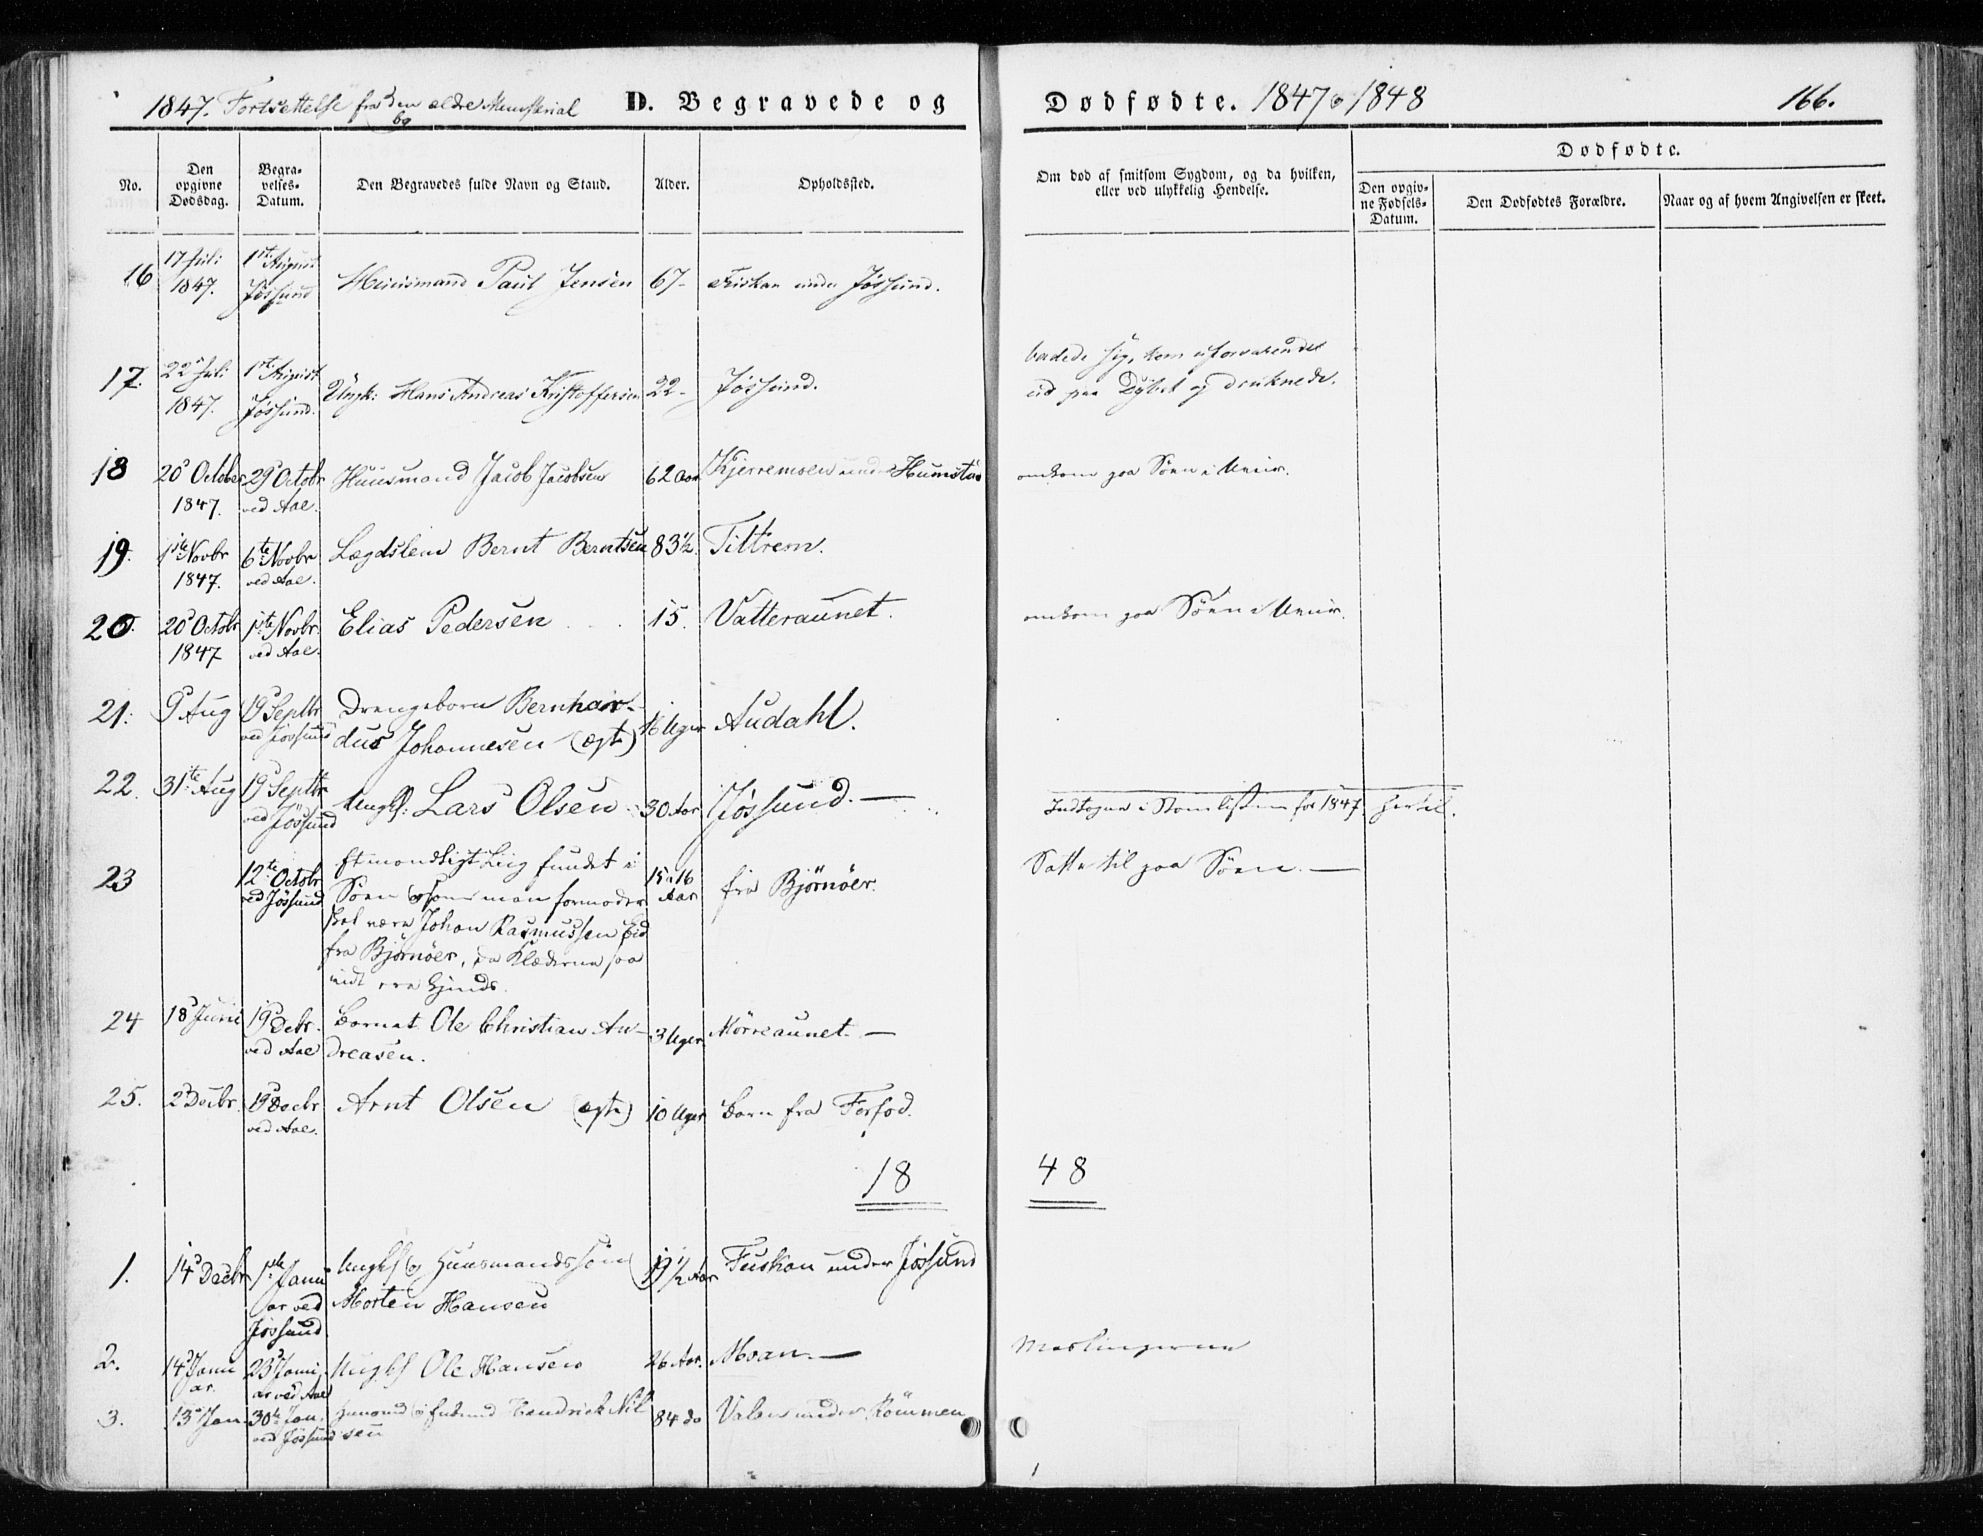 SAT, Ministerialprotokoller, klokkerbøker og fødselsregistre - Sør-Trøndelag, 655/L0677: Parish register (official) no. 655A06, 1847-1860, p. 166